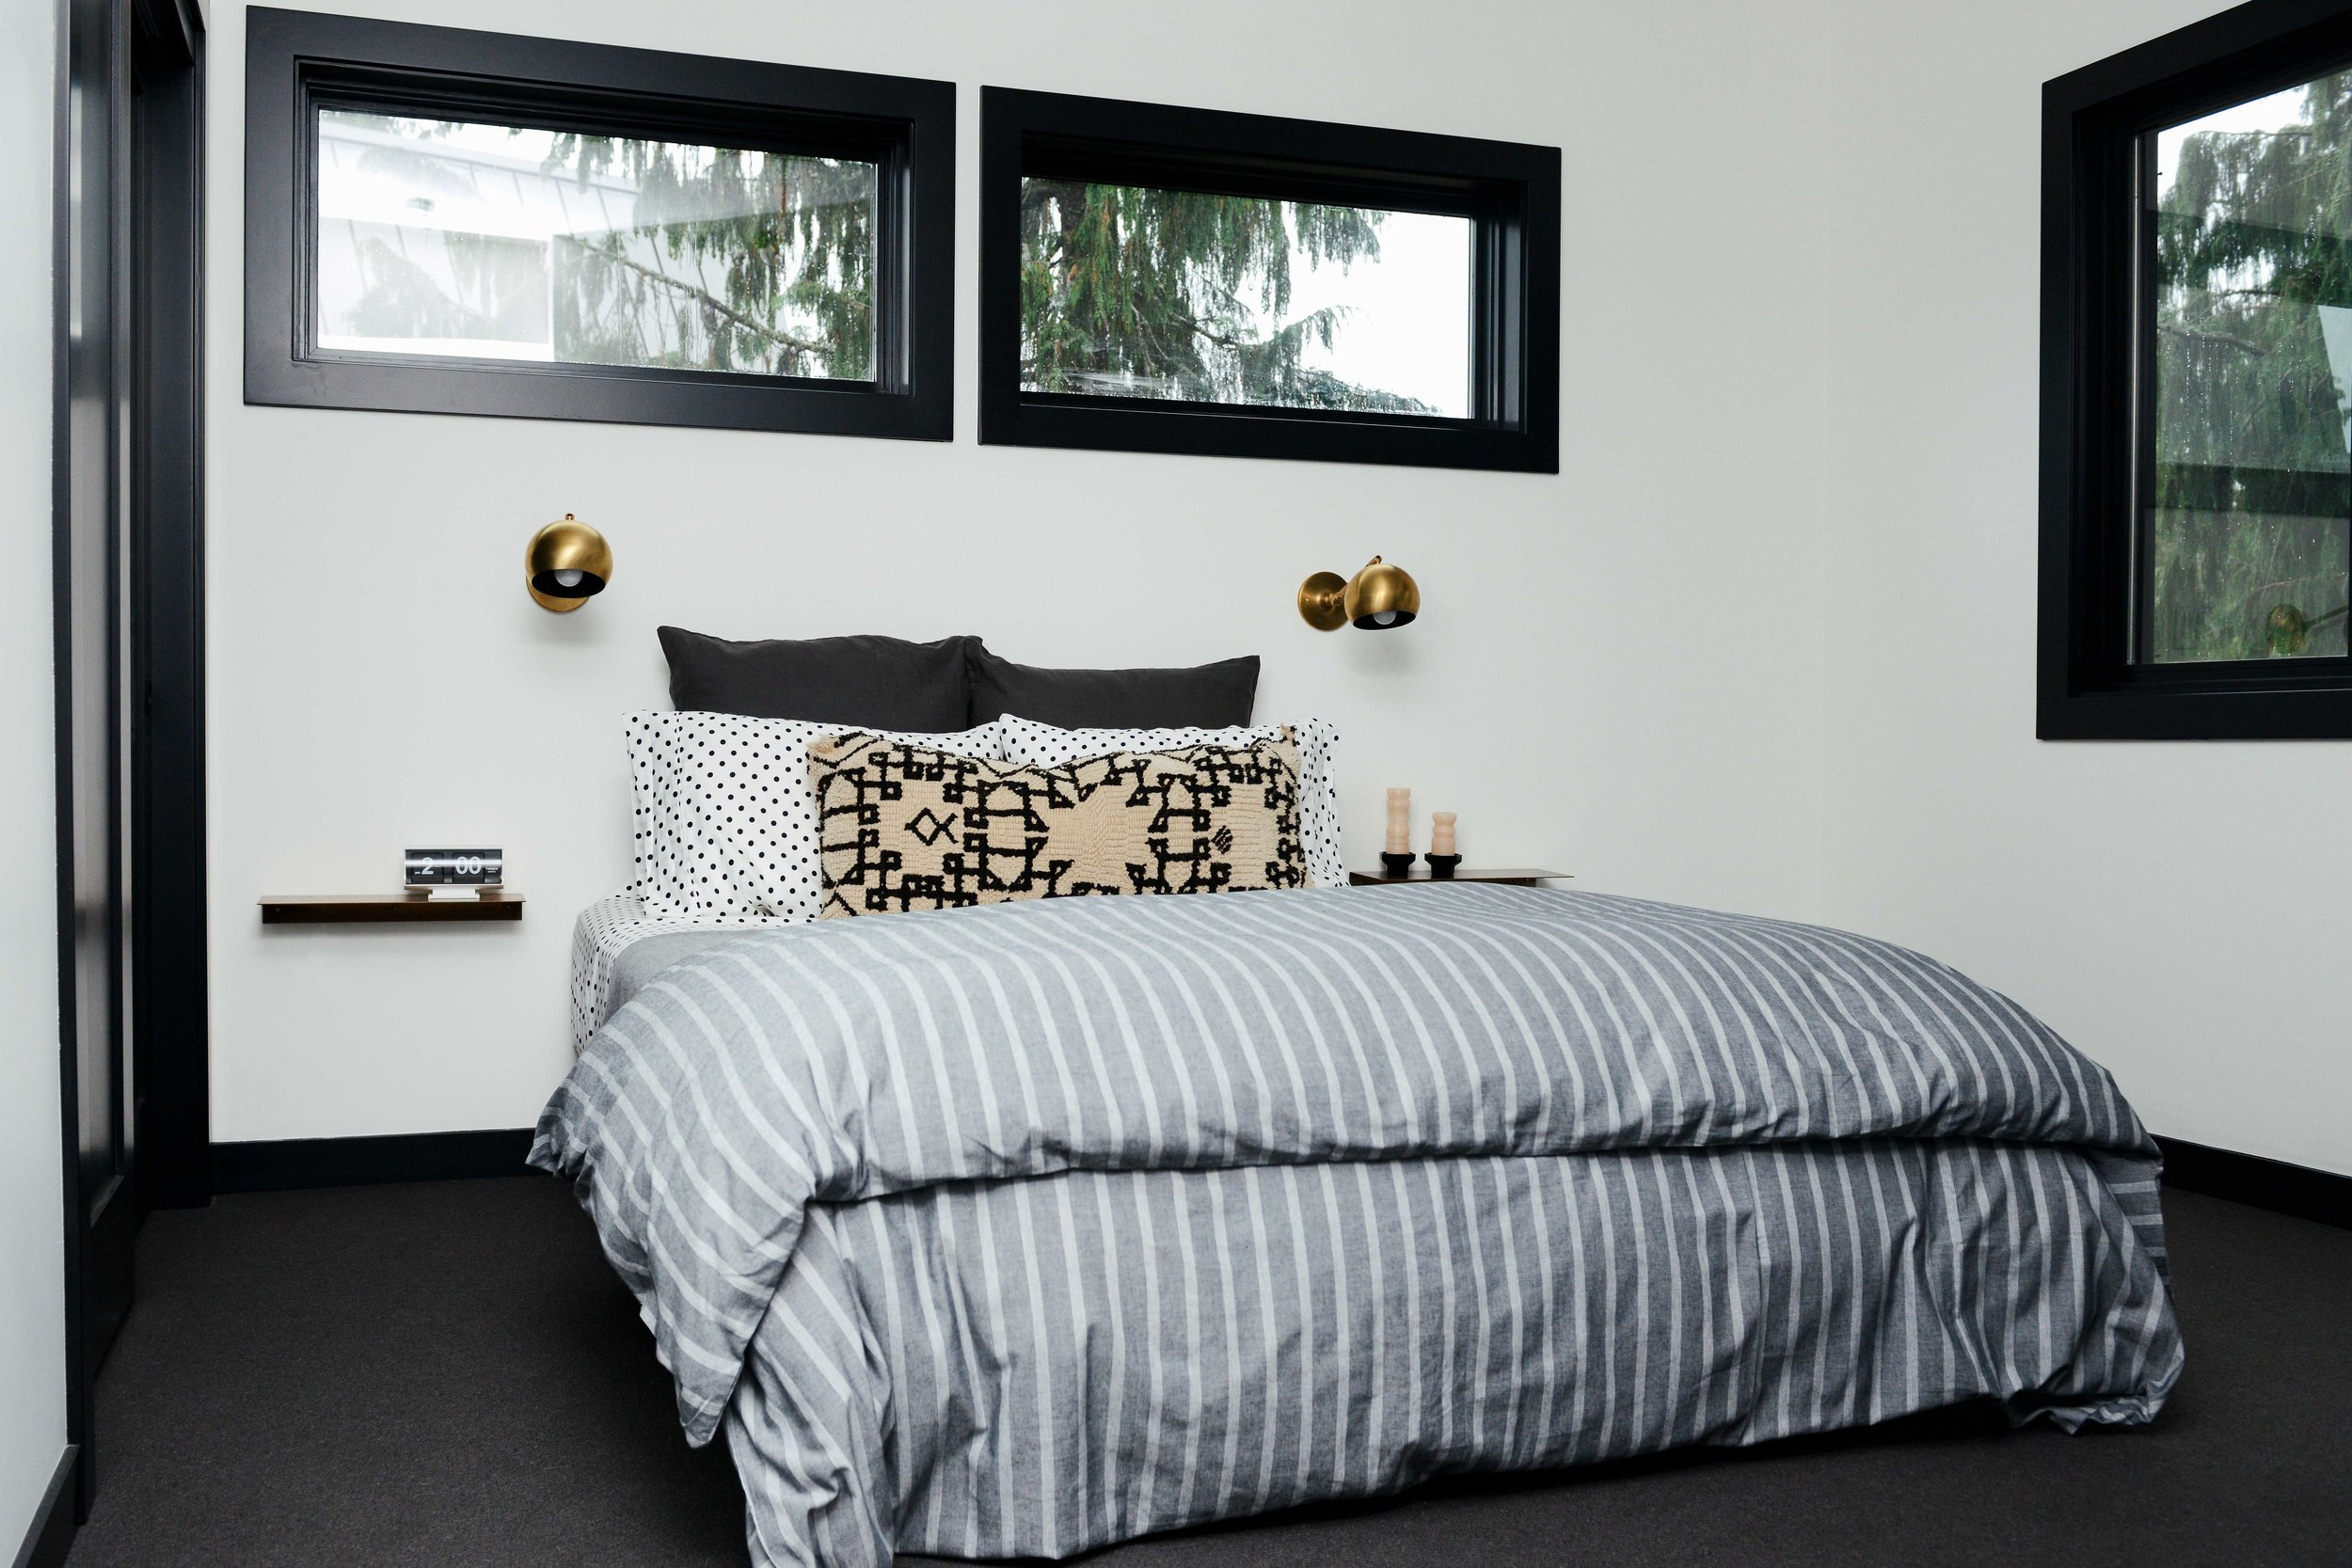 Modern Black & White Mountain Cabin Master Bedroom with Brass Schoolhouse Sconces | Casework Interior Design | Portland, OR